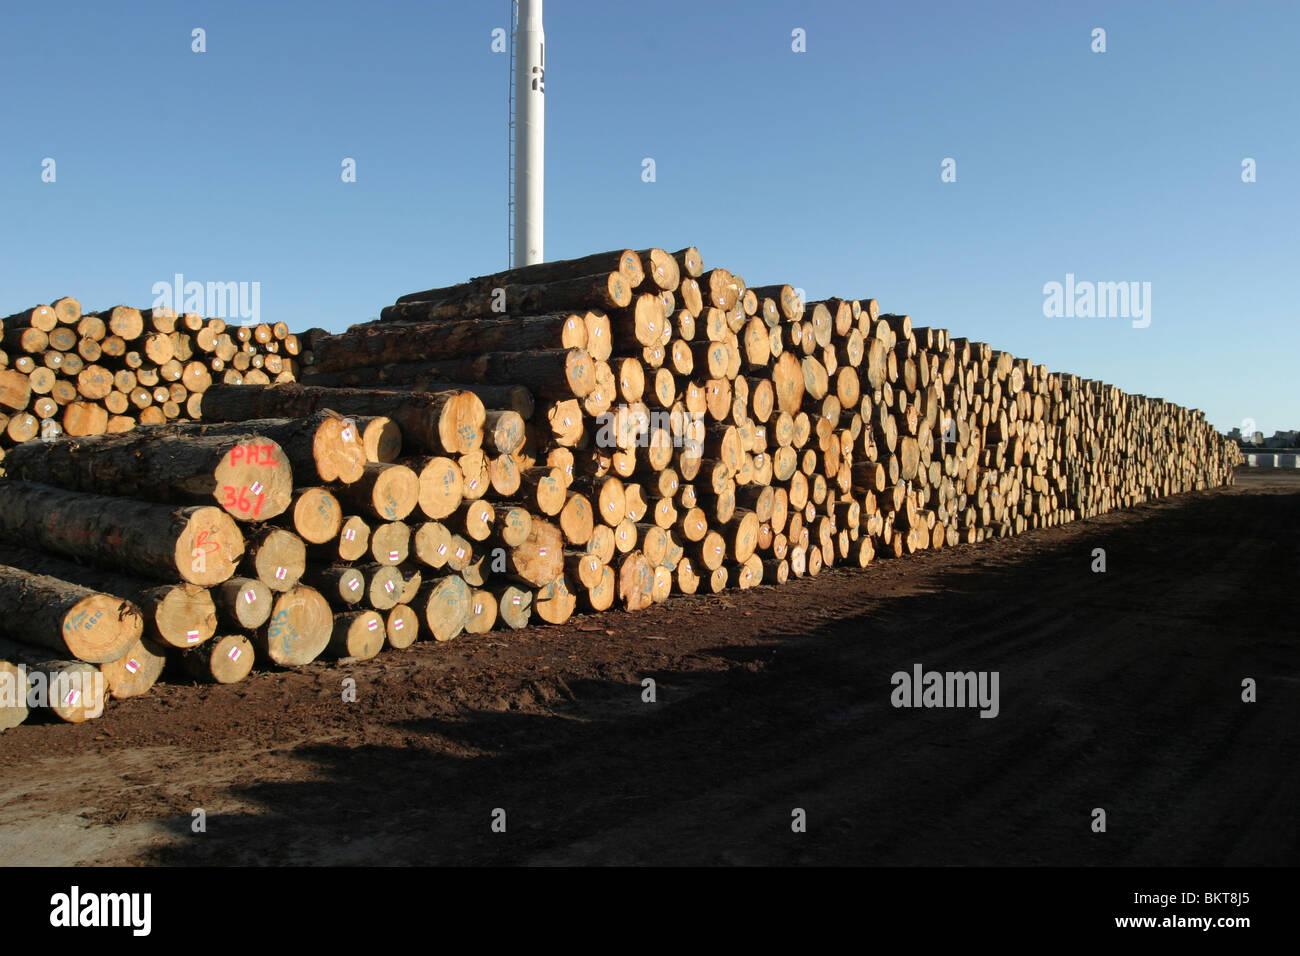 stack of pinus radiata log new zealand - Stock Image